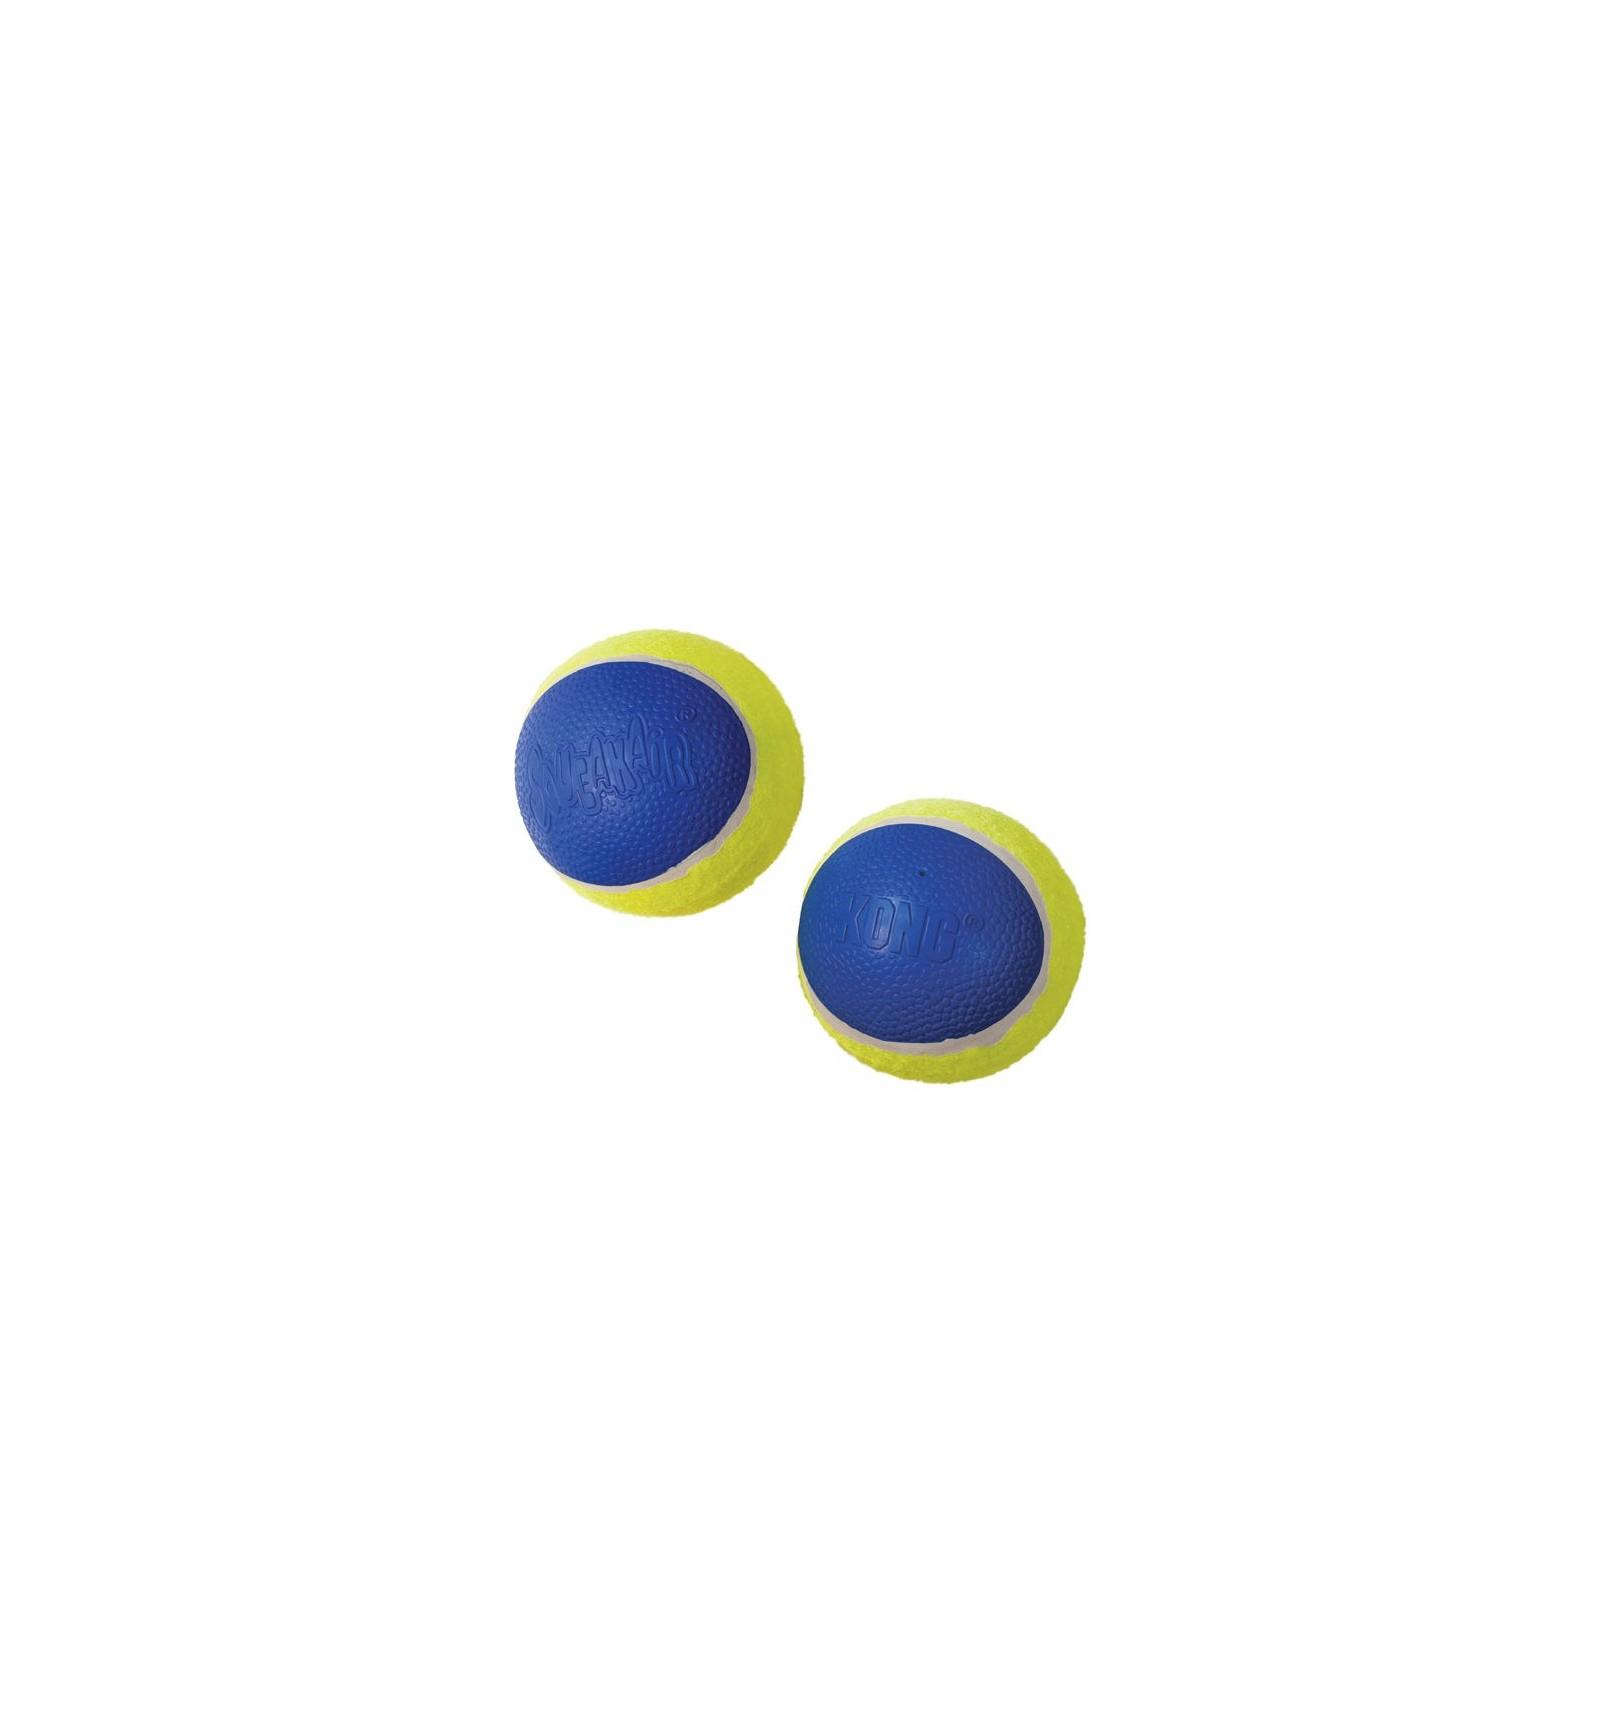 bc13a6fe0de8 Brinquedo Air Kong Bola de Ténis c/ Som Ultra Squeakair - Tamanho M